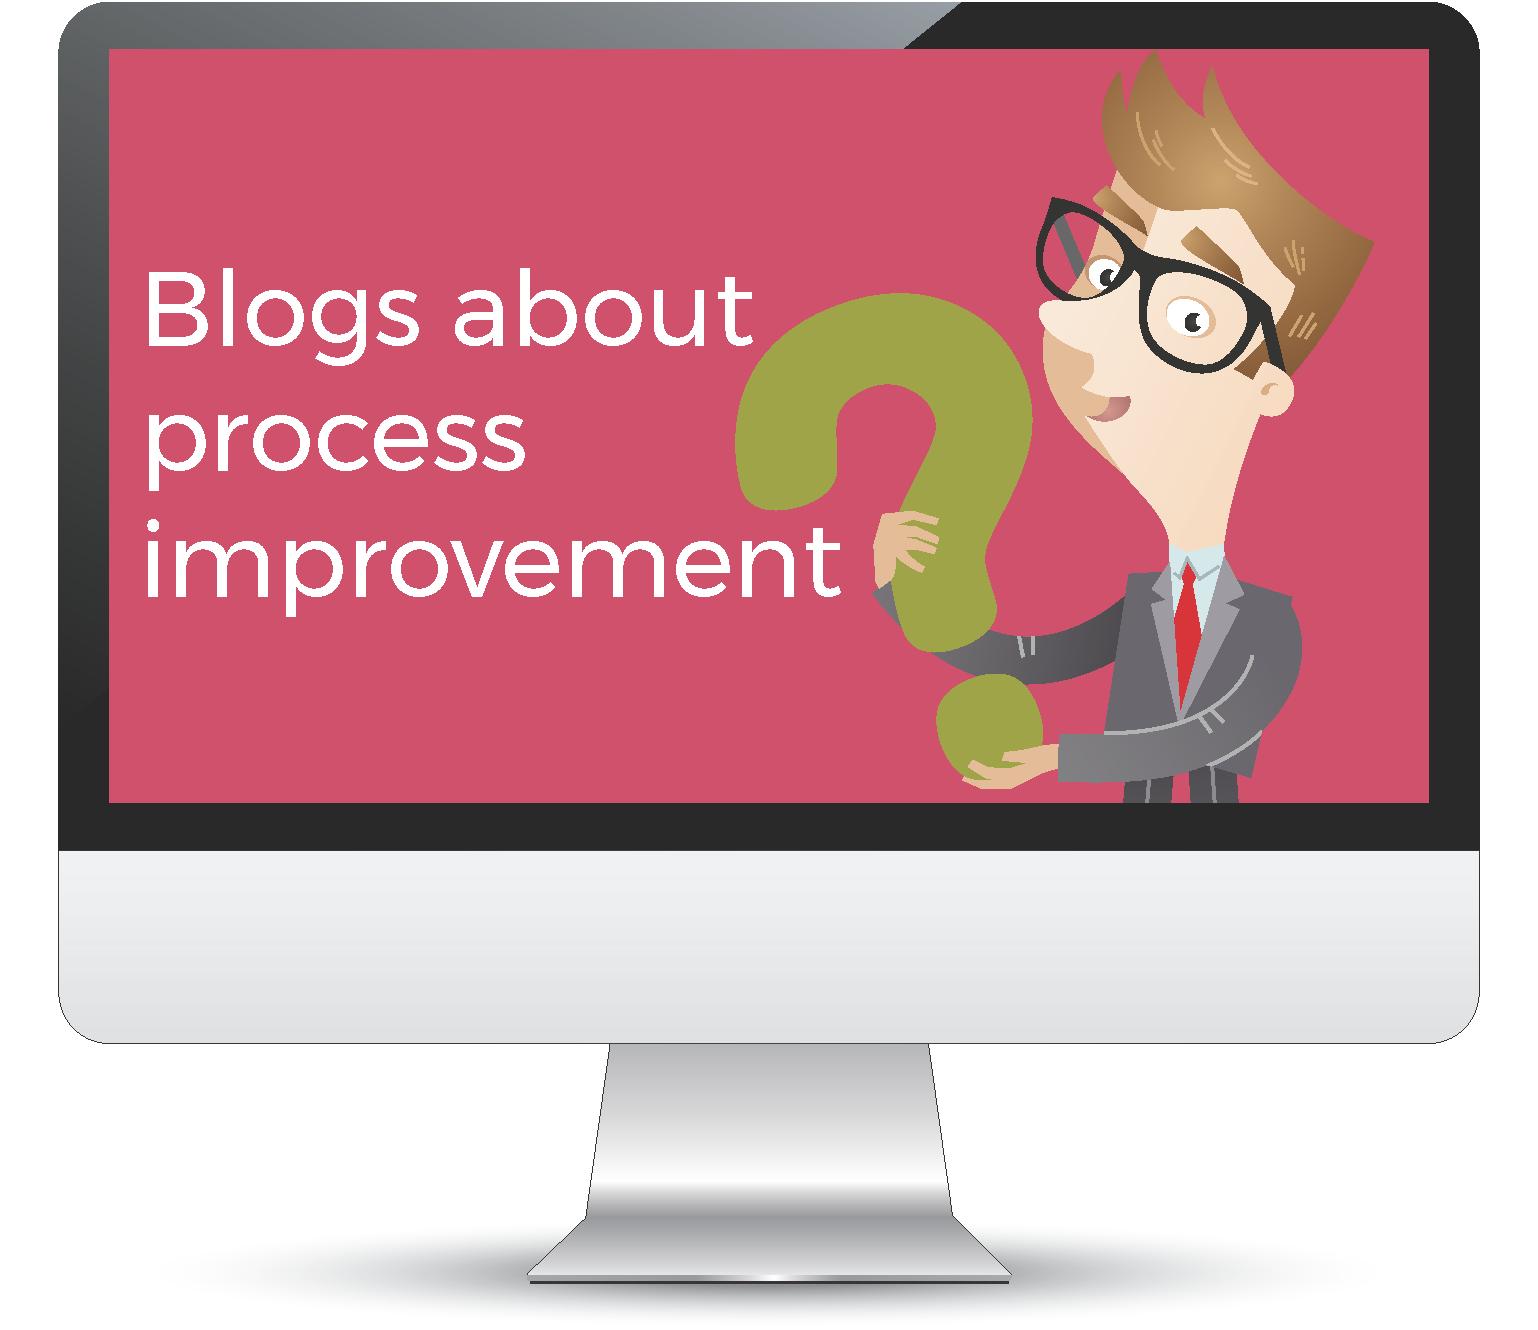 Process improvement blog